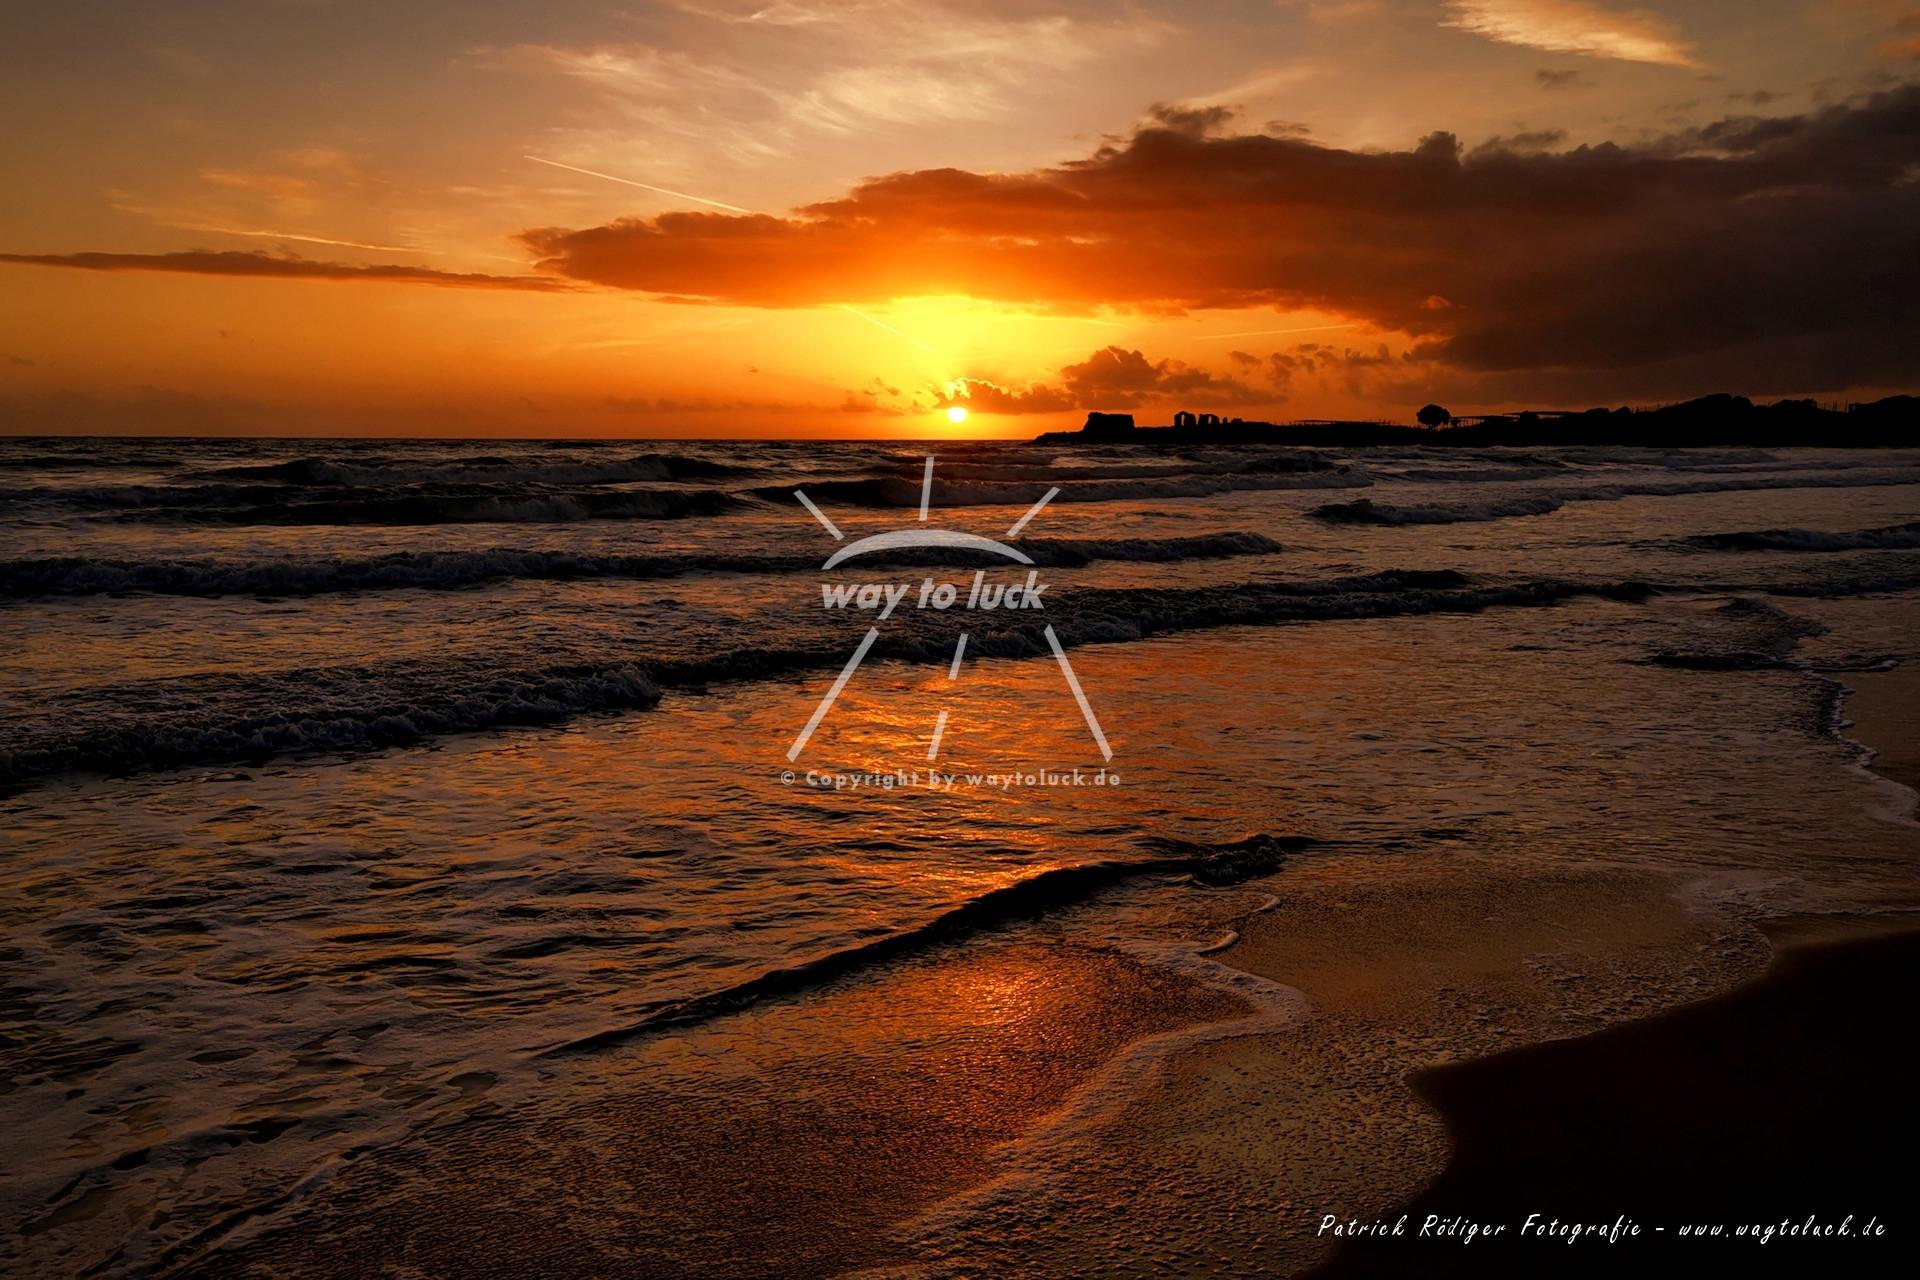 Roter Sonnenuntergang Sizilien Strand Meer Wolken